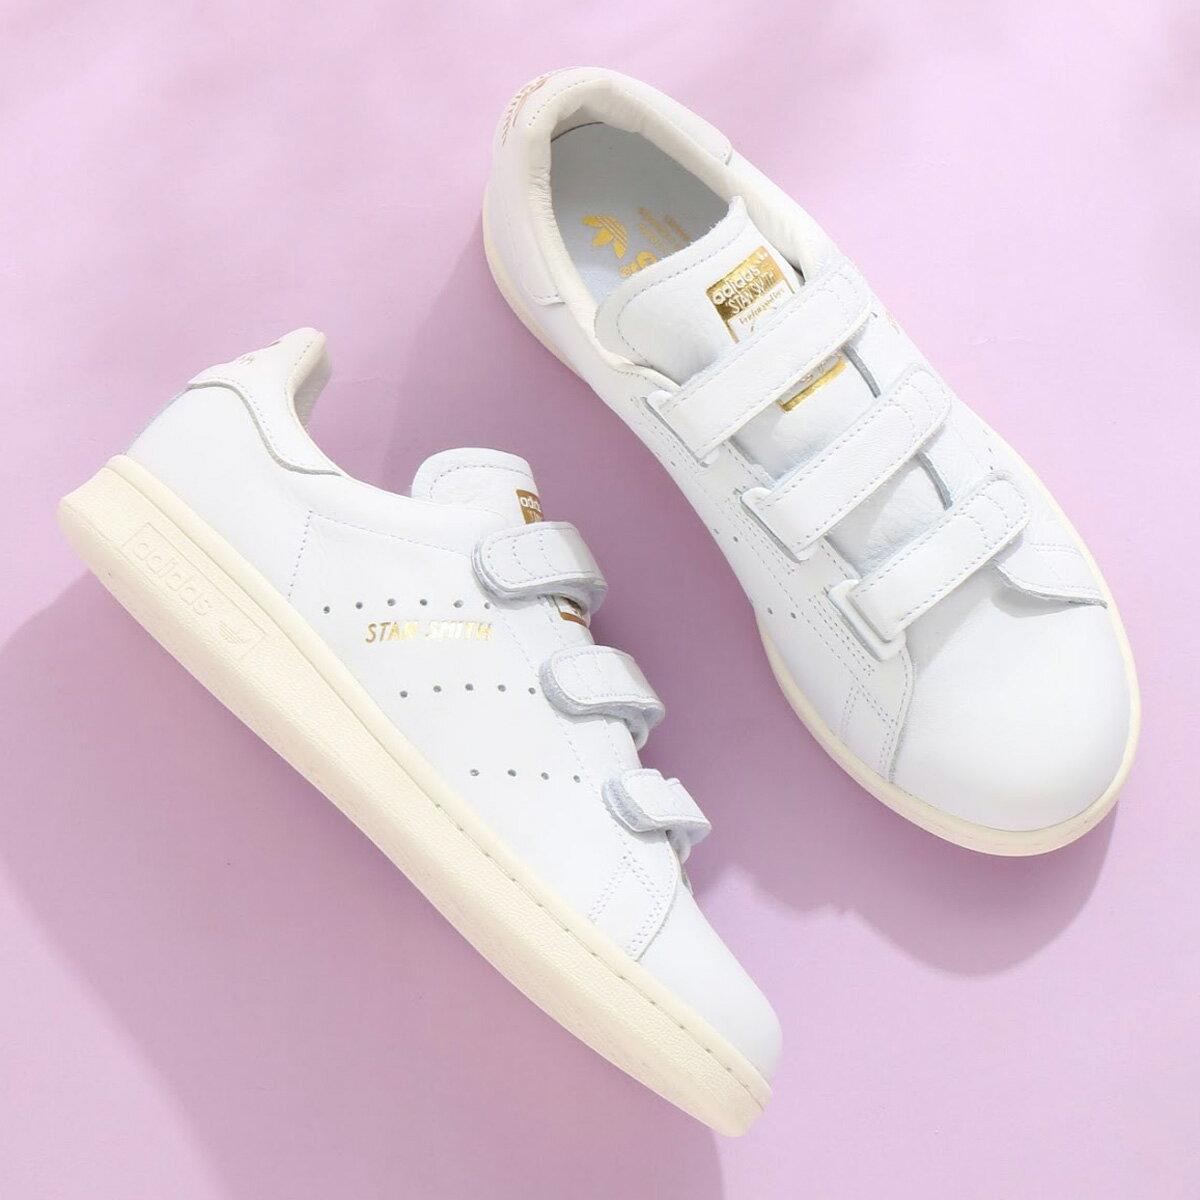 adidas Originals STAN SMITH CF(アディダス オリジナルス スタンスミス CF)Running White/Running White/Gold Met【レディース スニーカー】18SS-I